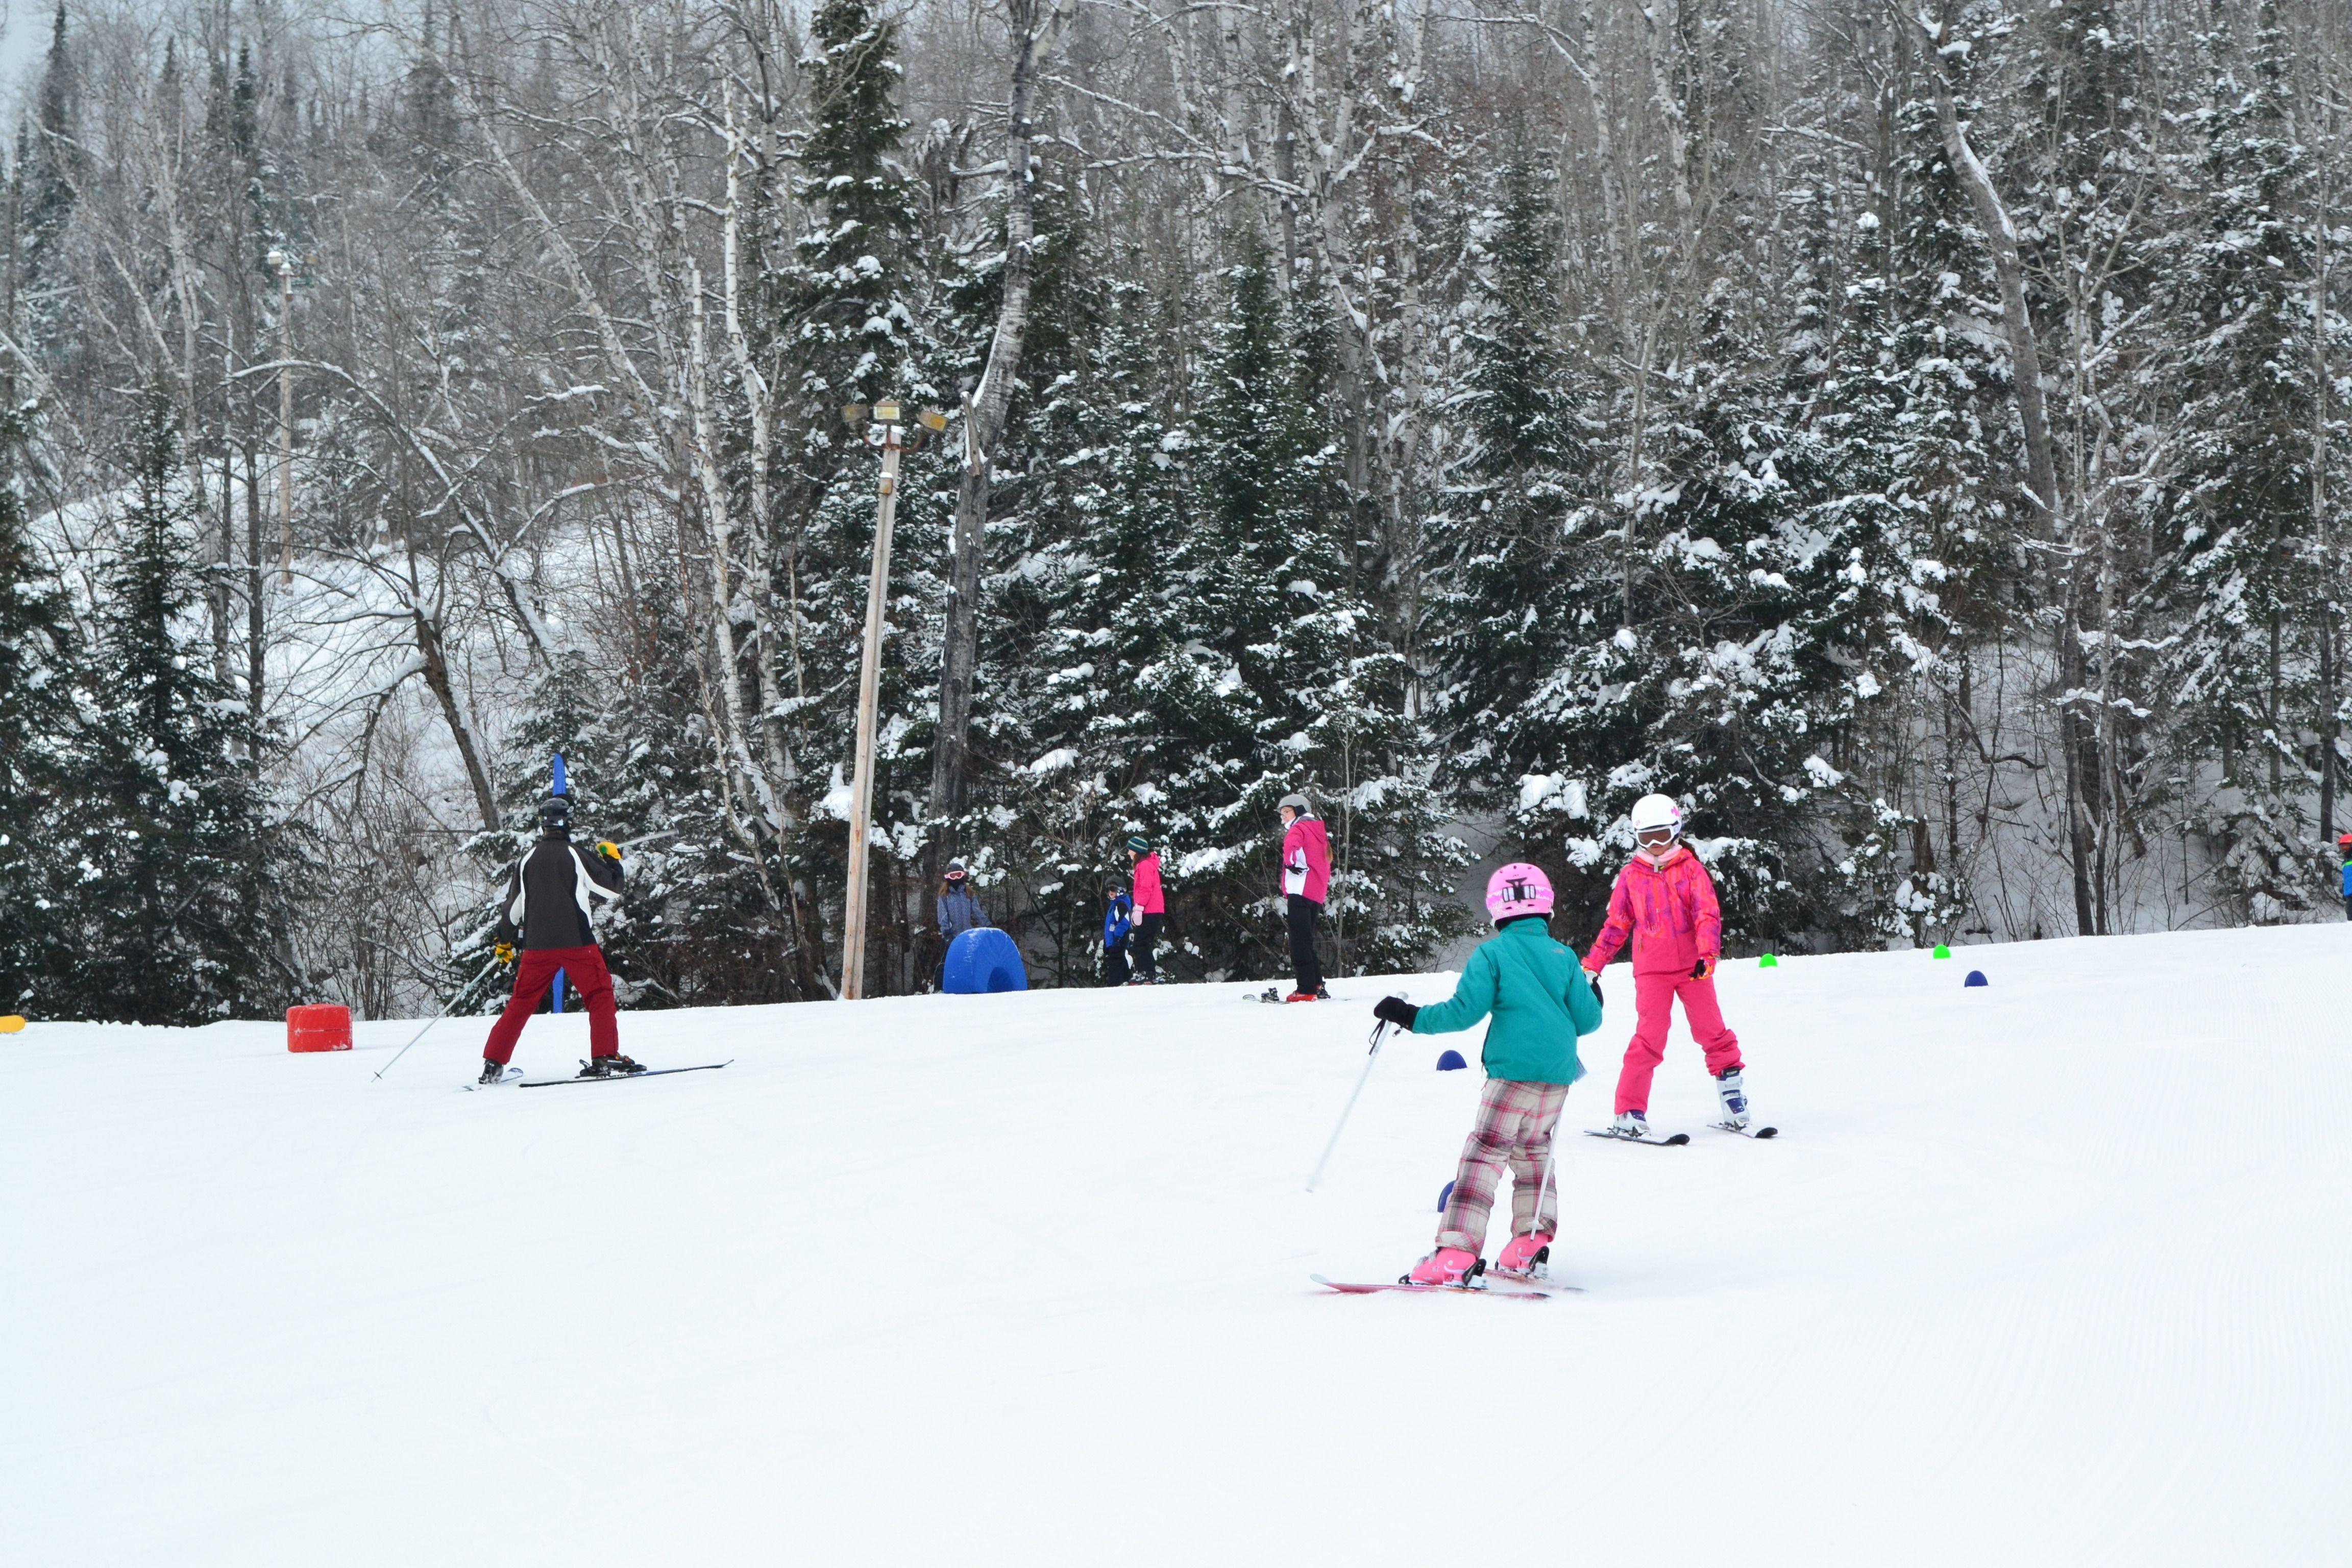 Away They Go Giantsridge Onlyinmn Cross Country Skiing Downhill Skiing Ski Trails